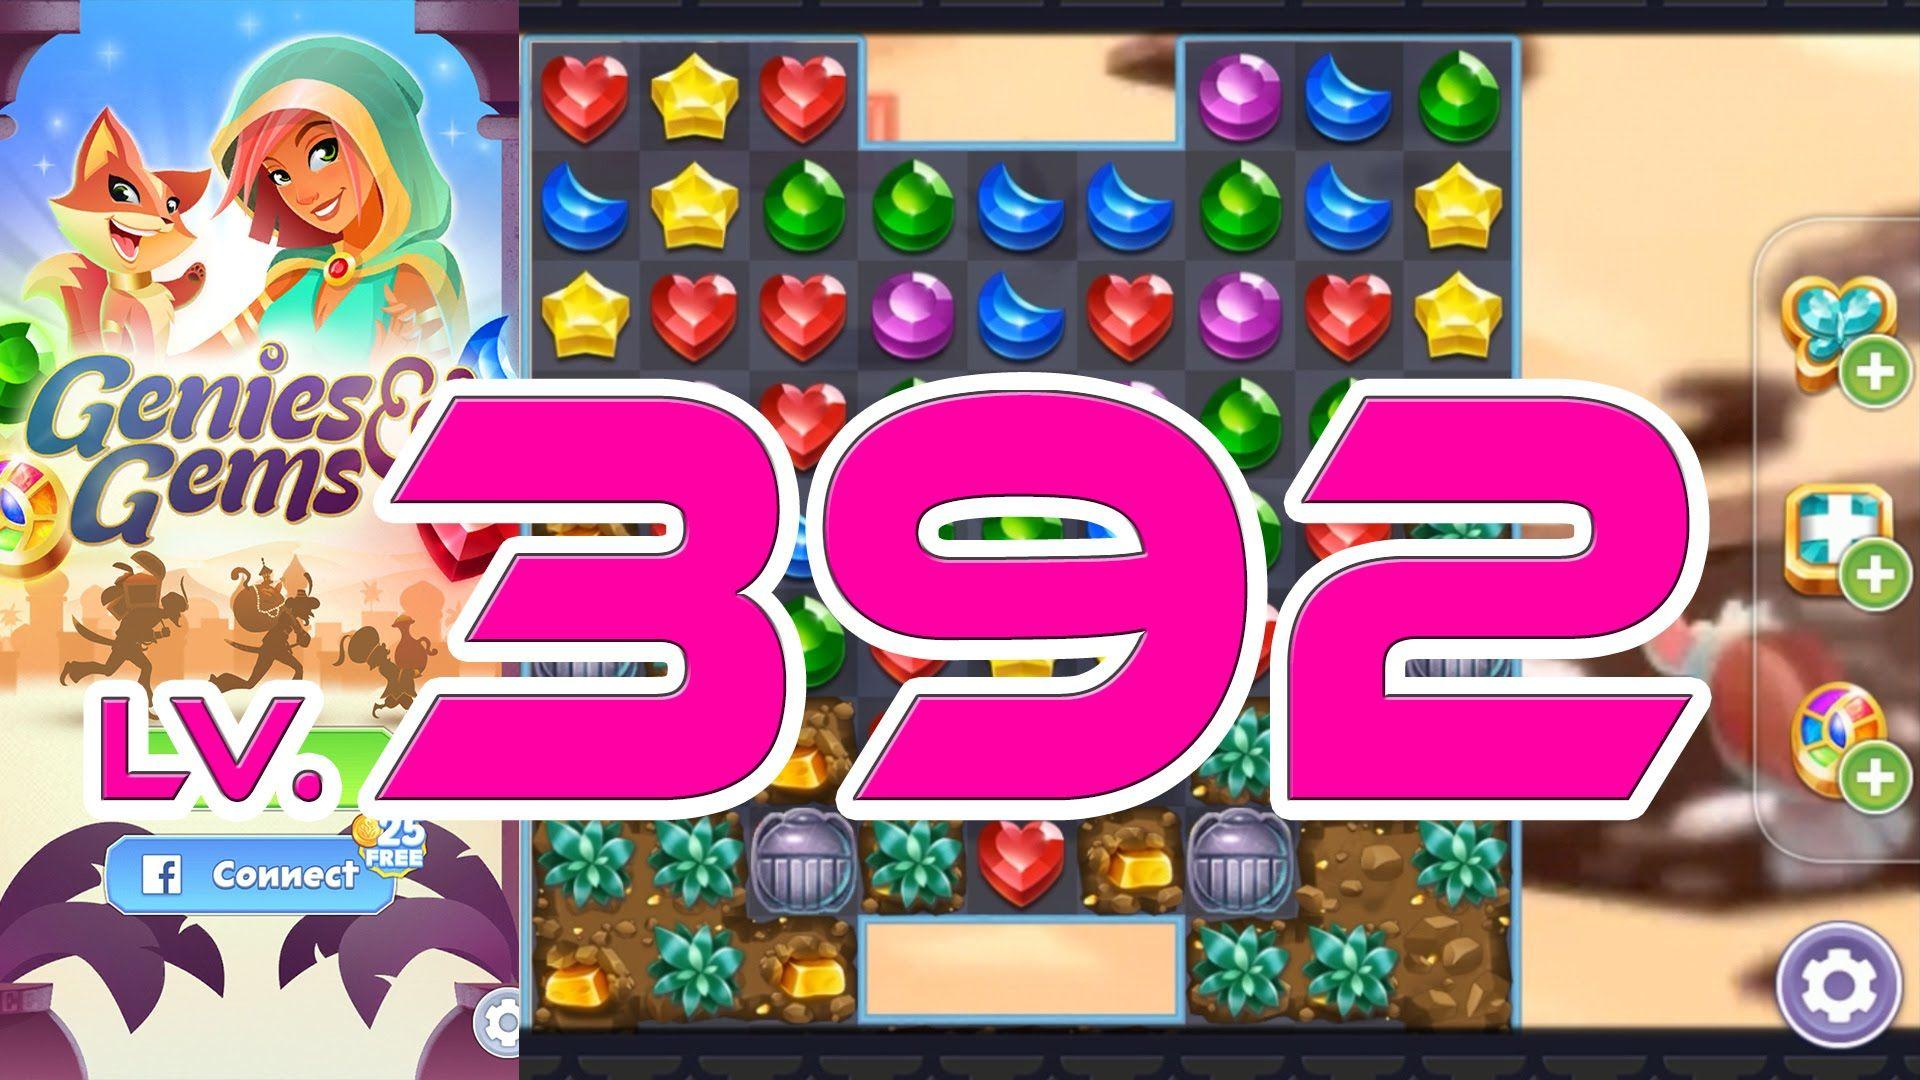 Genies & Gems - Level 392 (1080p/60fps) | Genies & Gems